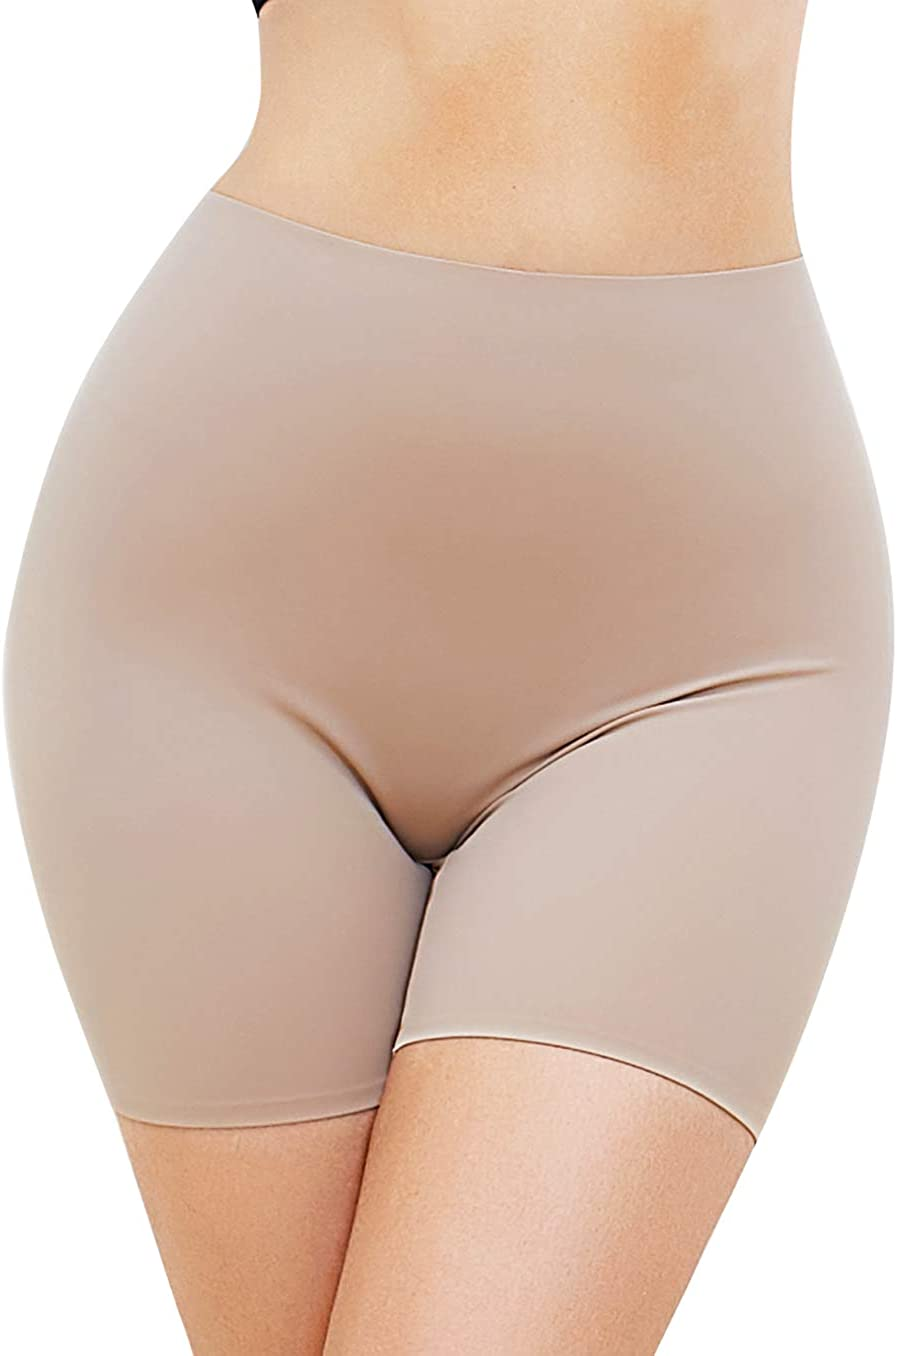 SLIMBELLE Bragas Pantalón Mujer Bóxer Elástico Braguitas Faja Moldeador Anti Rozaduras Shorts Adelgazante Sin Costuras Reductoras Shapewear Ultrafinos Panty Antiroces